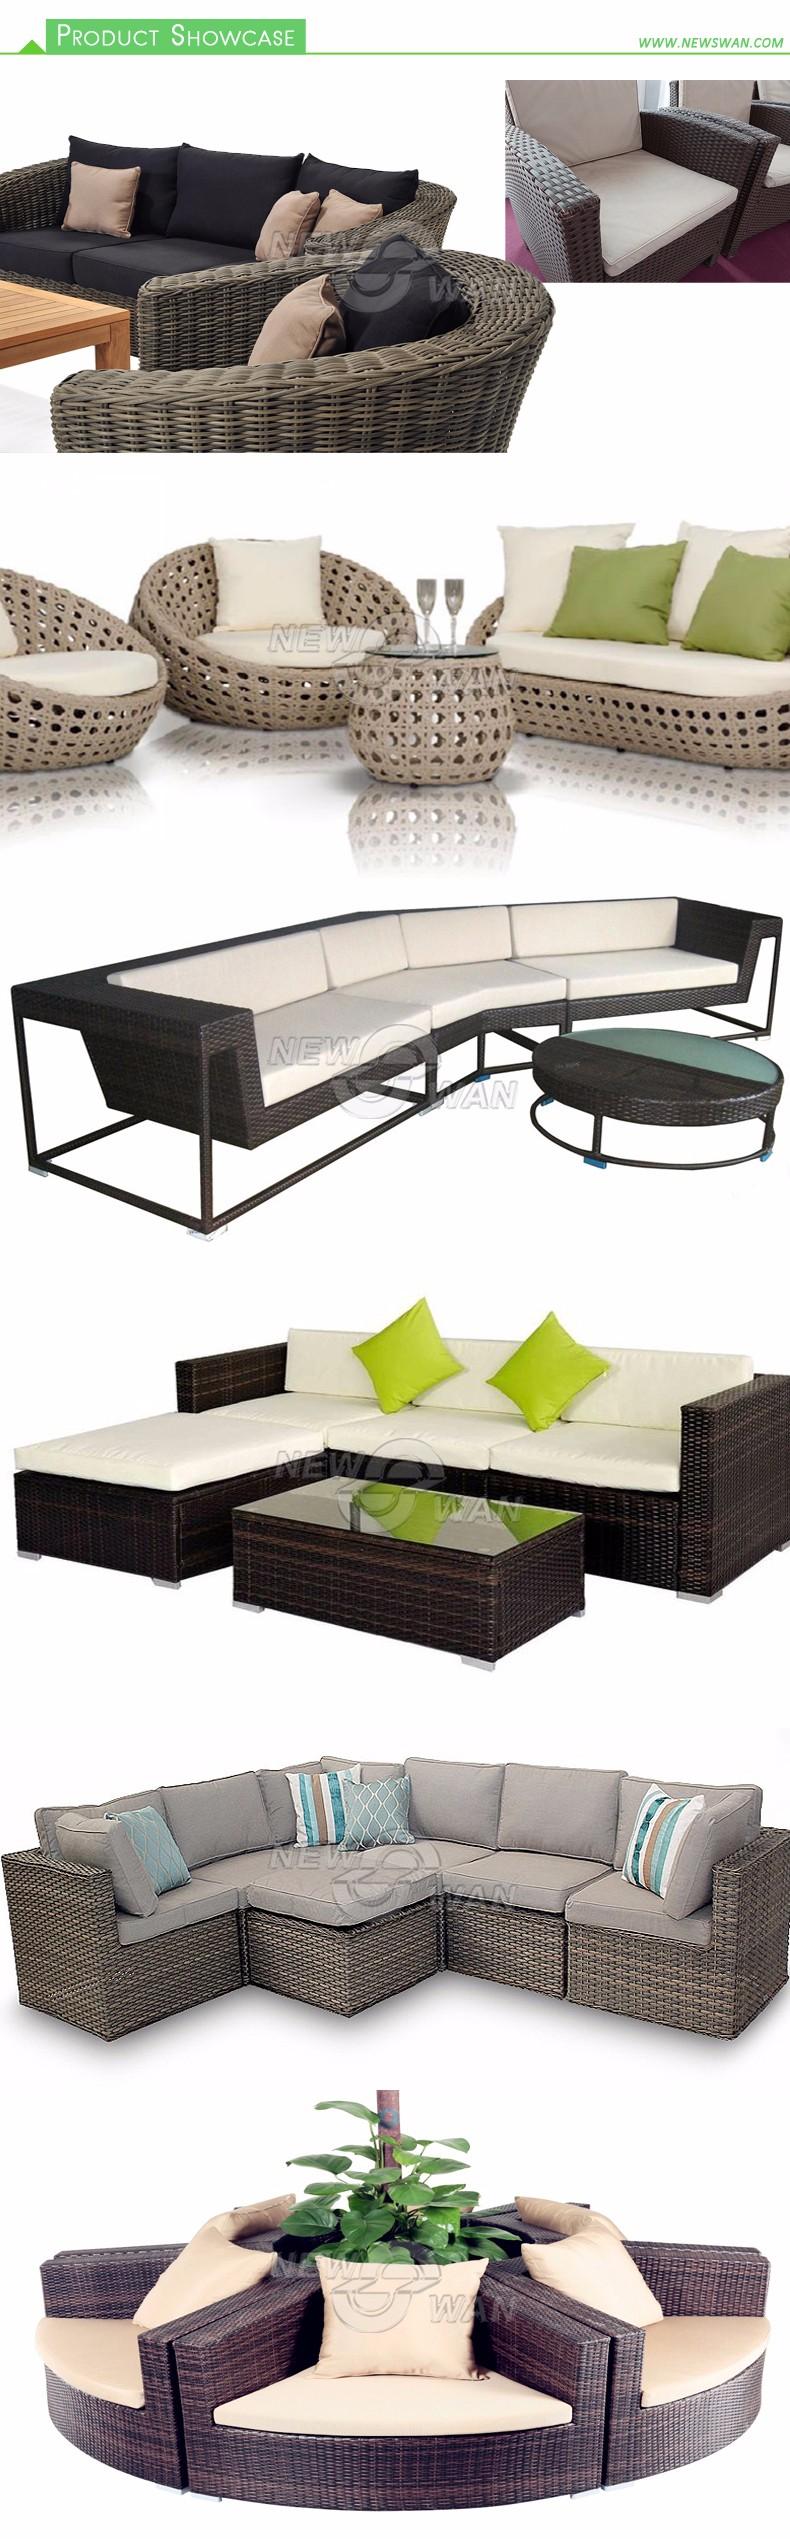 Rattan Sofa Outdoor Semi Circle Furniture Buy Rattan